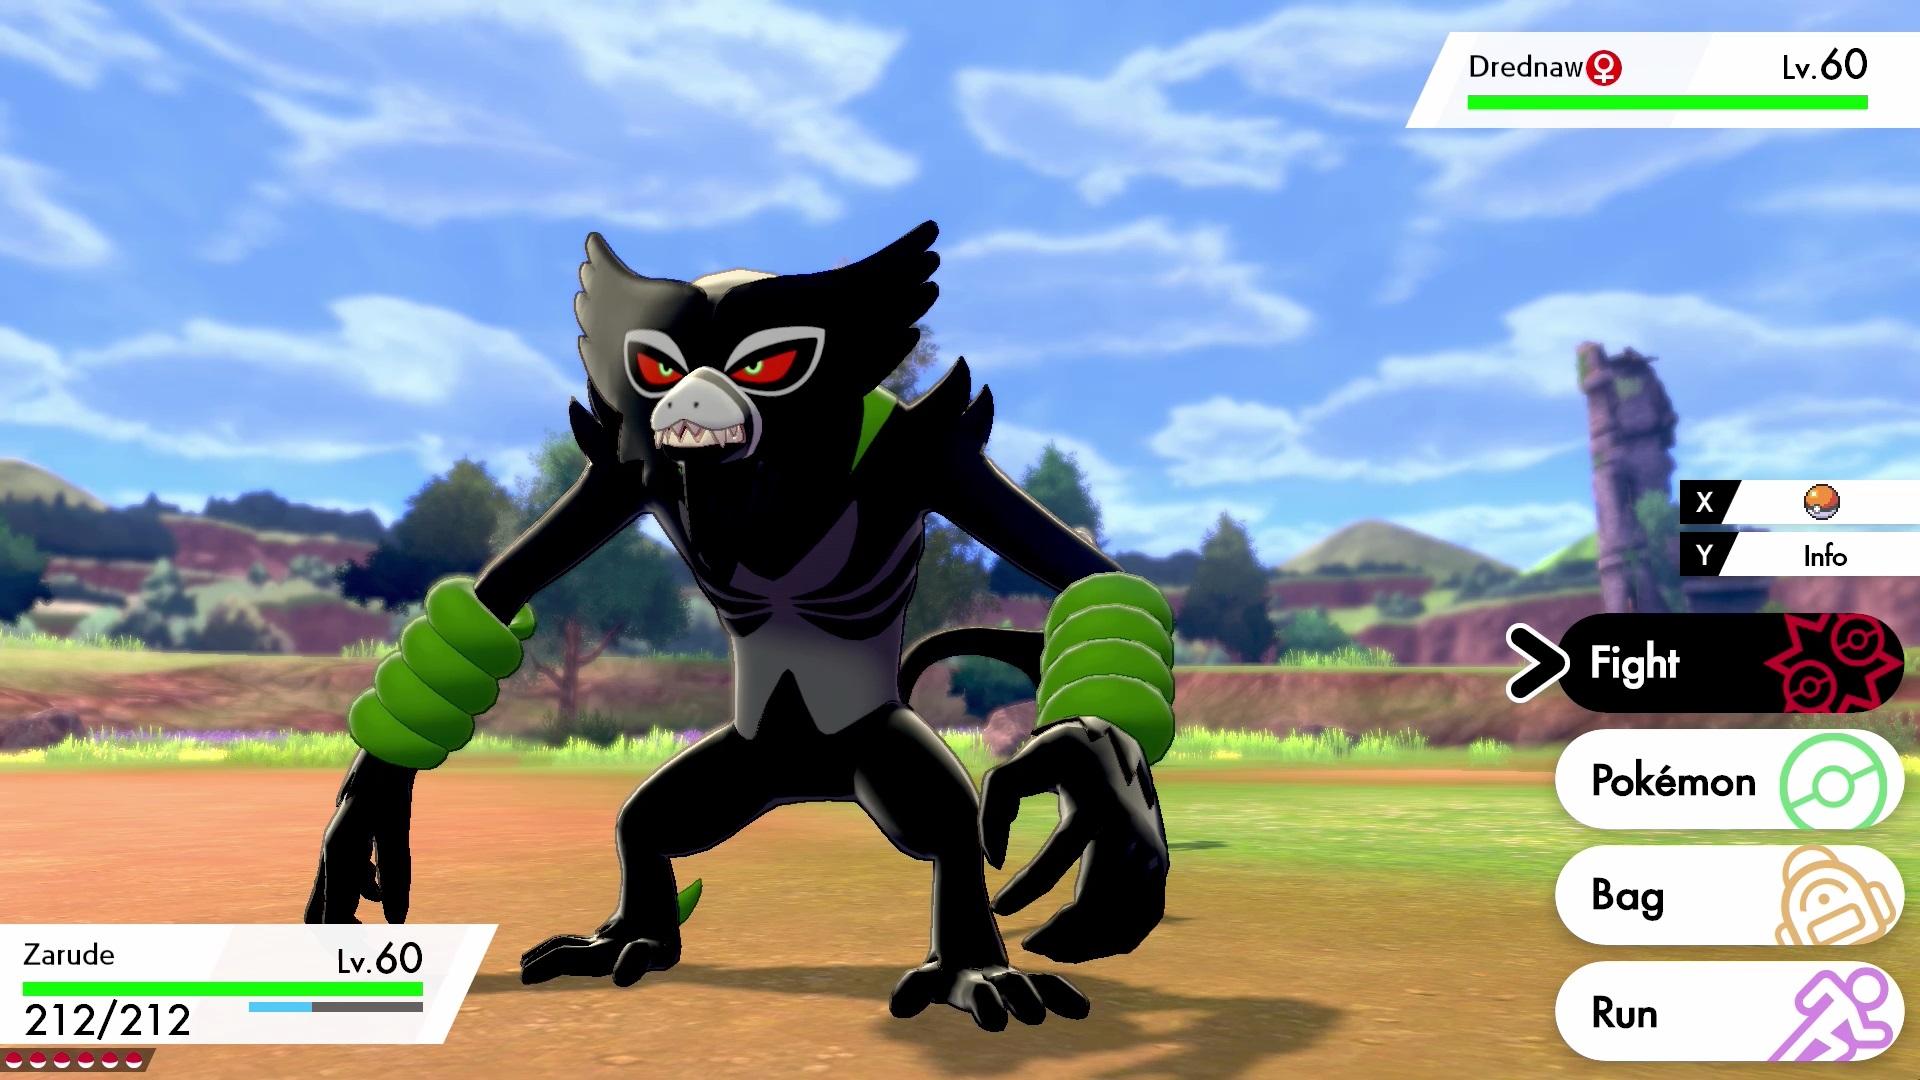 Pokémon Sword and Pokémon Shield introduce Zarude, the Mythical Rogue Monkey Pokémon